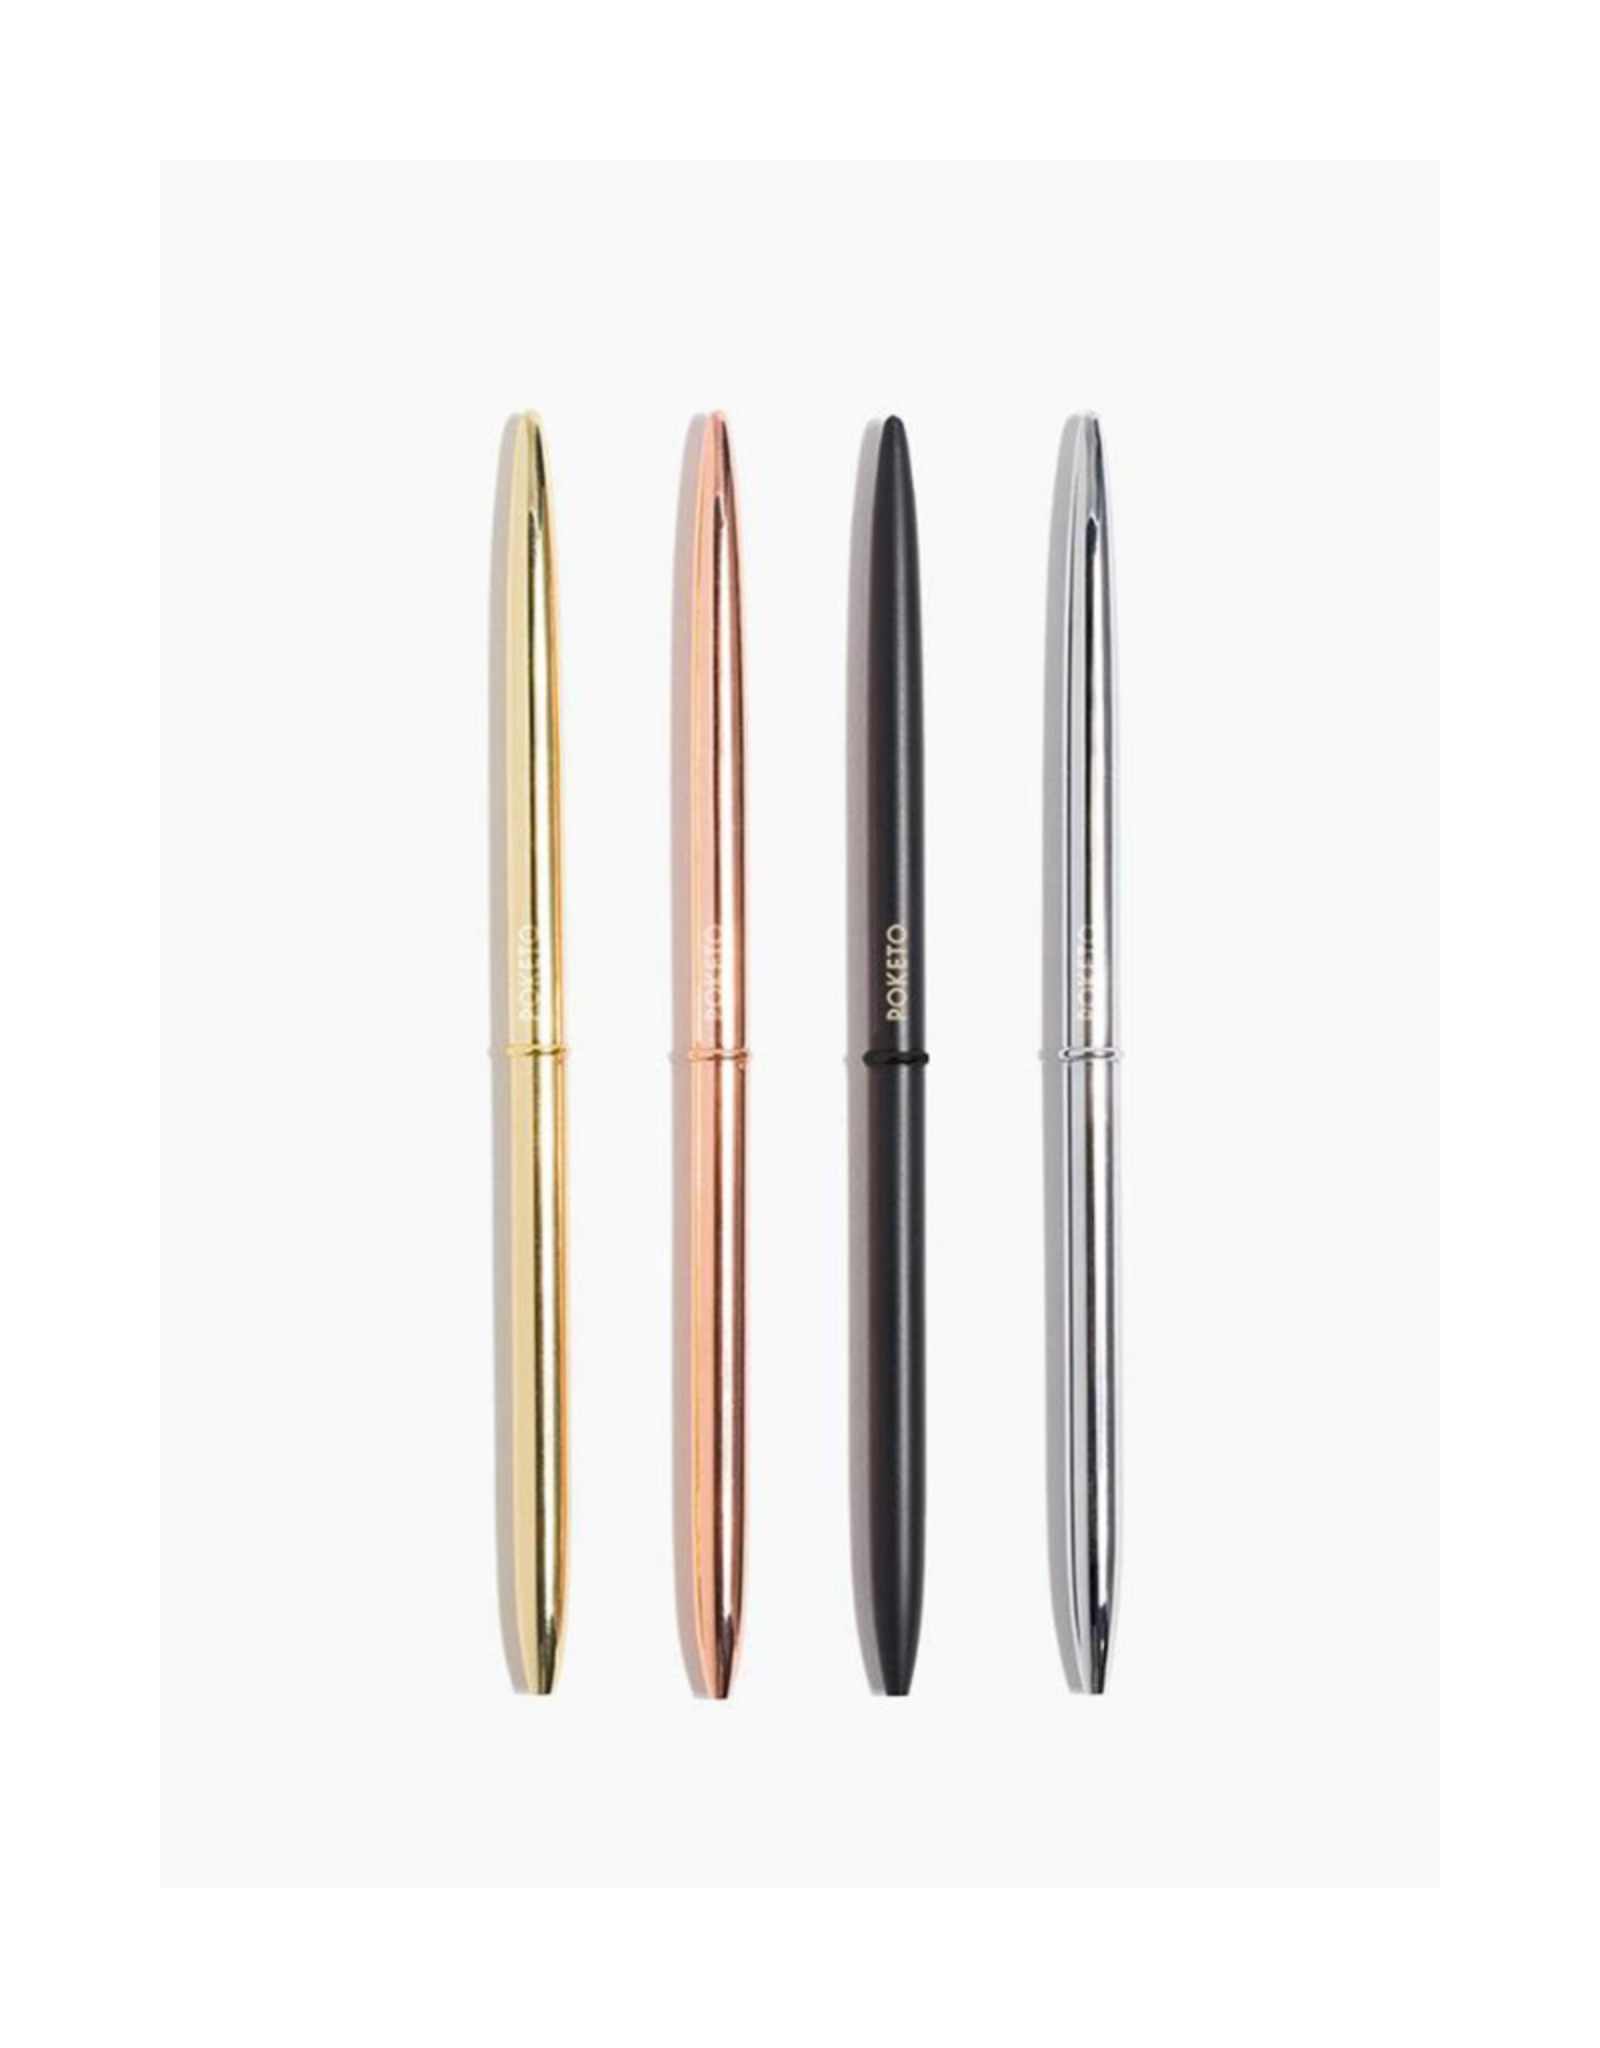 Poketo 4 Pack Slim Pens Classic - 4 Pack